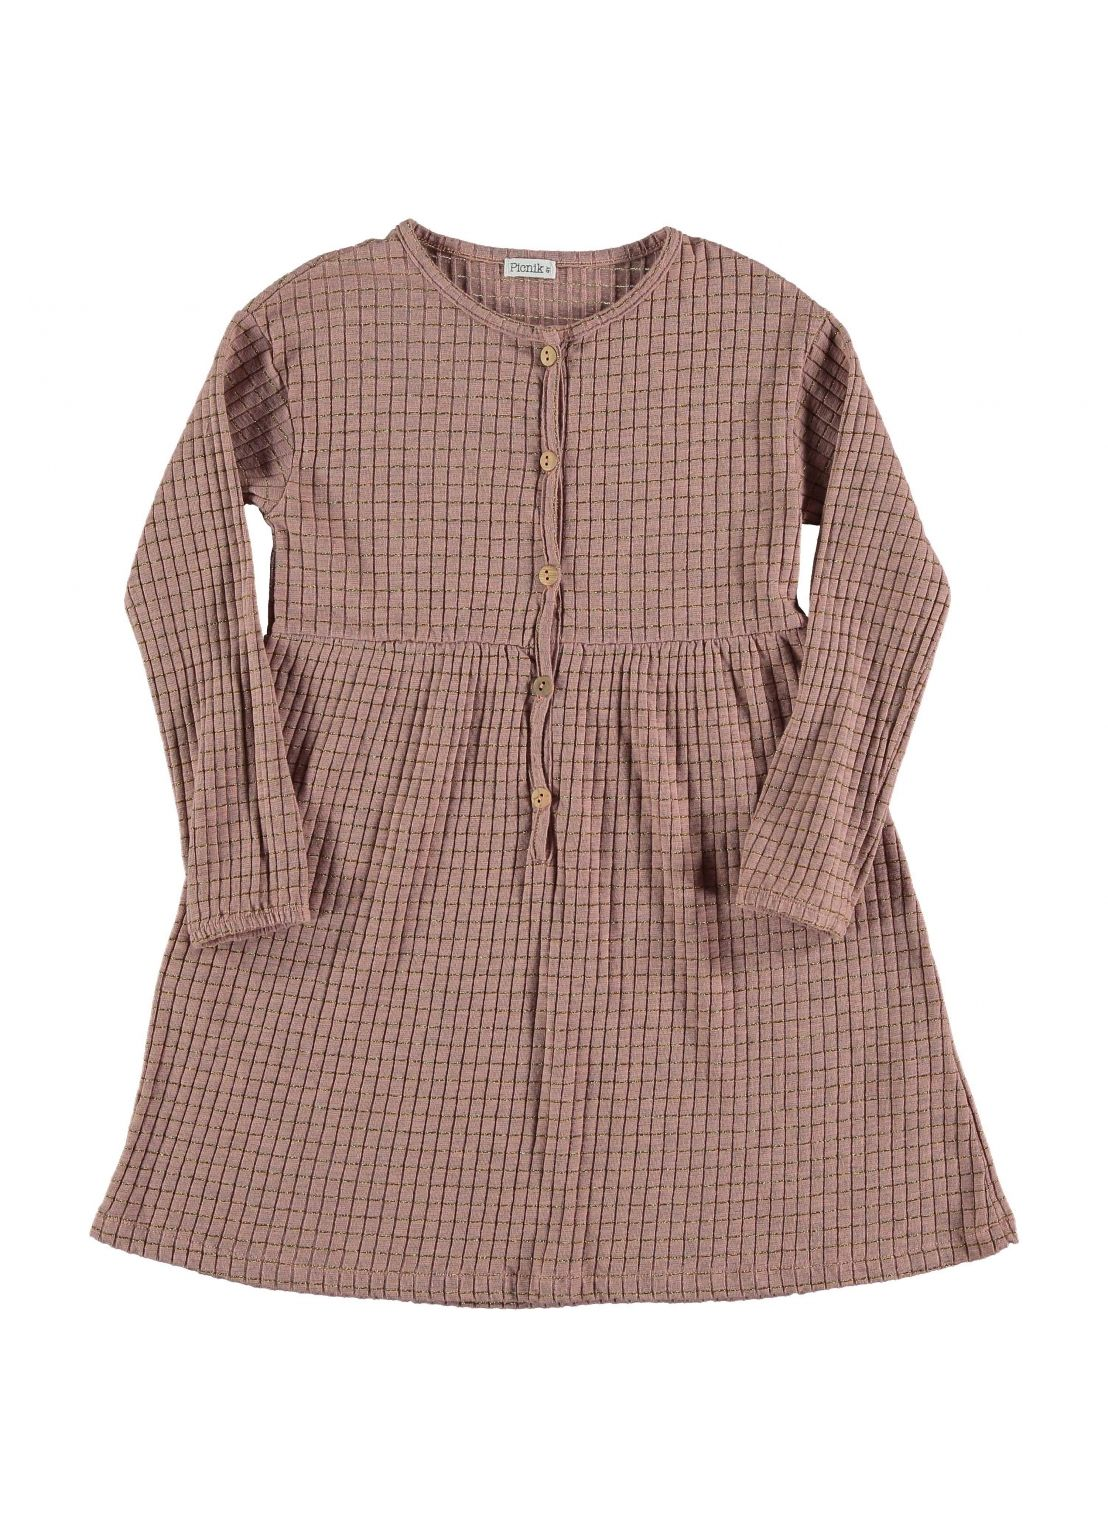 Kid  DRESS Girl- 65 % CO, 25 % PES, 5 % EA, 5 % Lúrex- Knitted